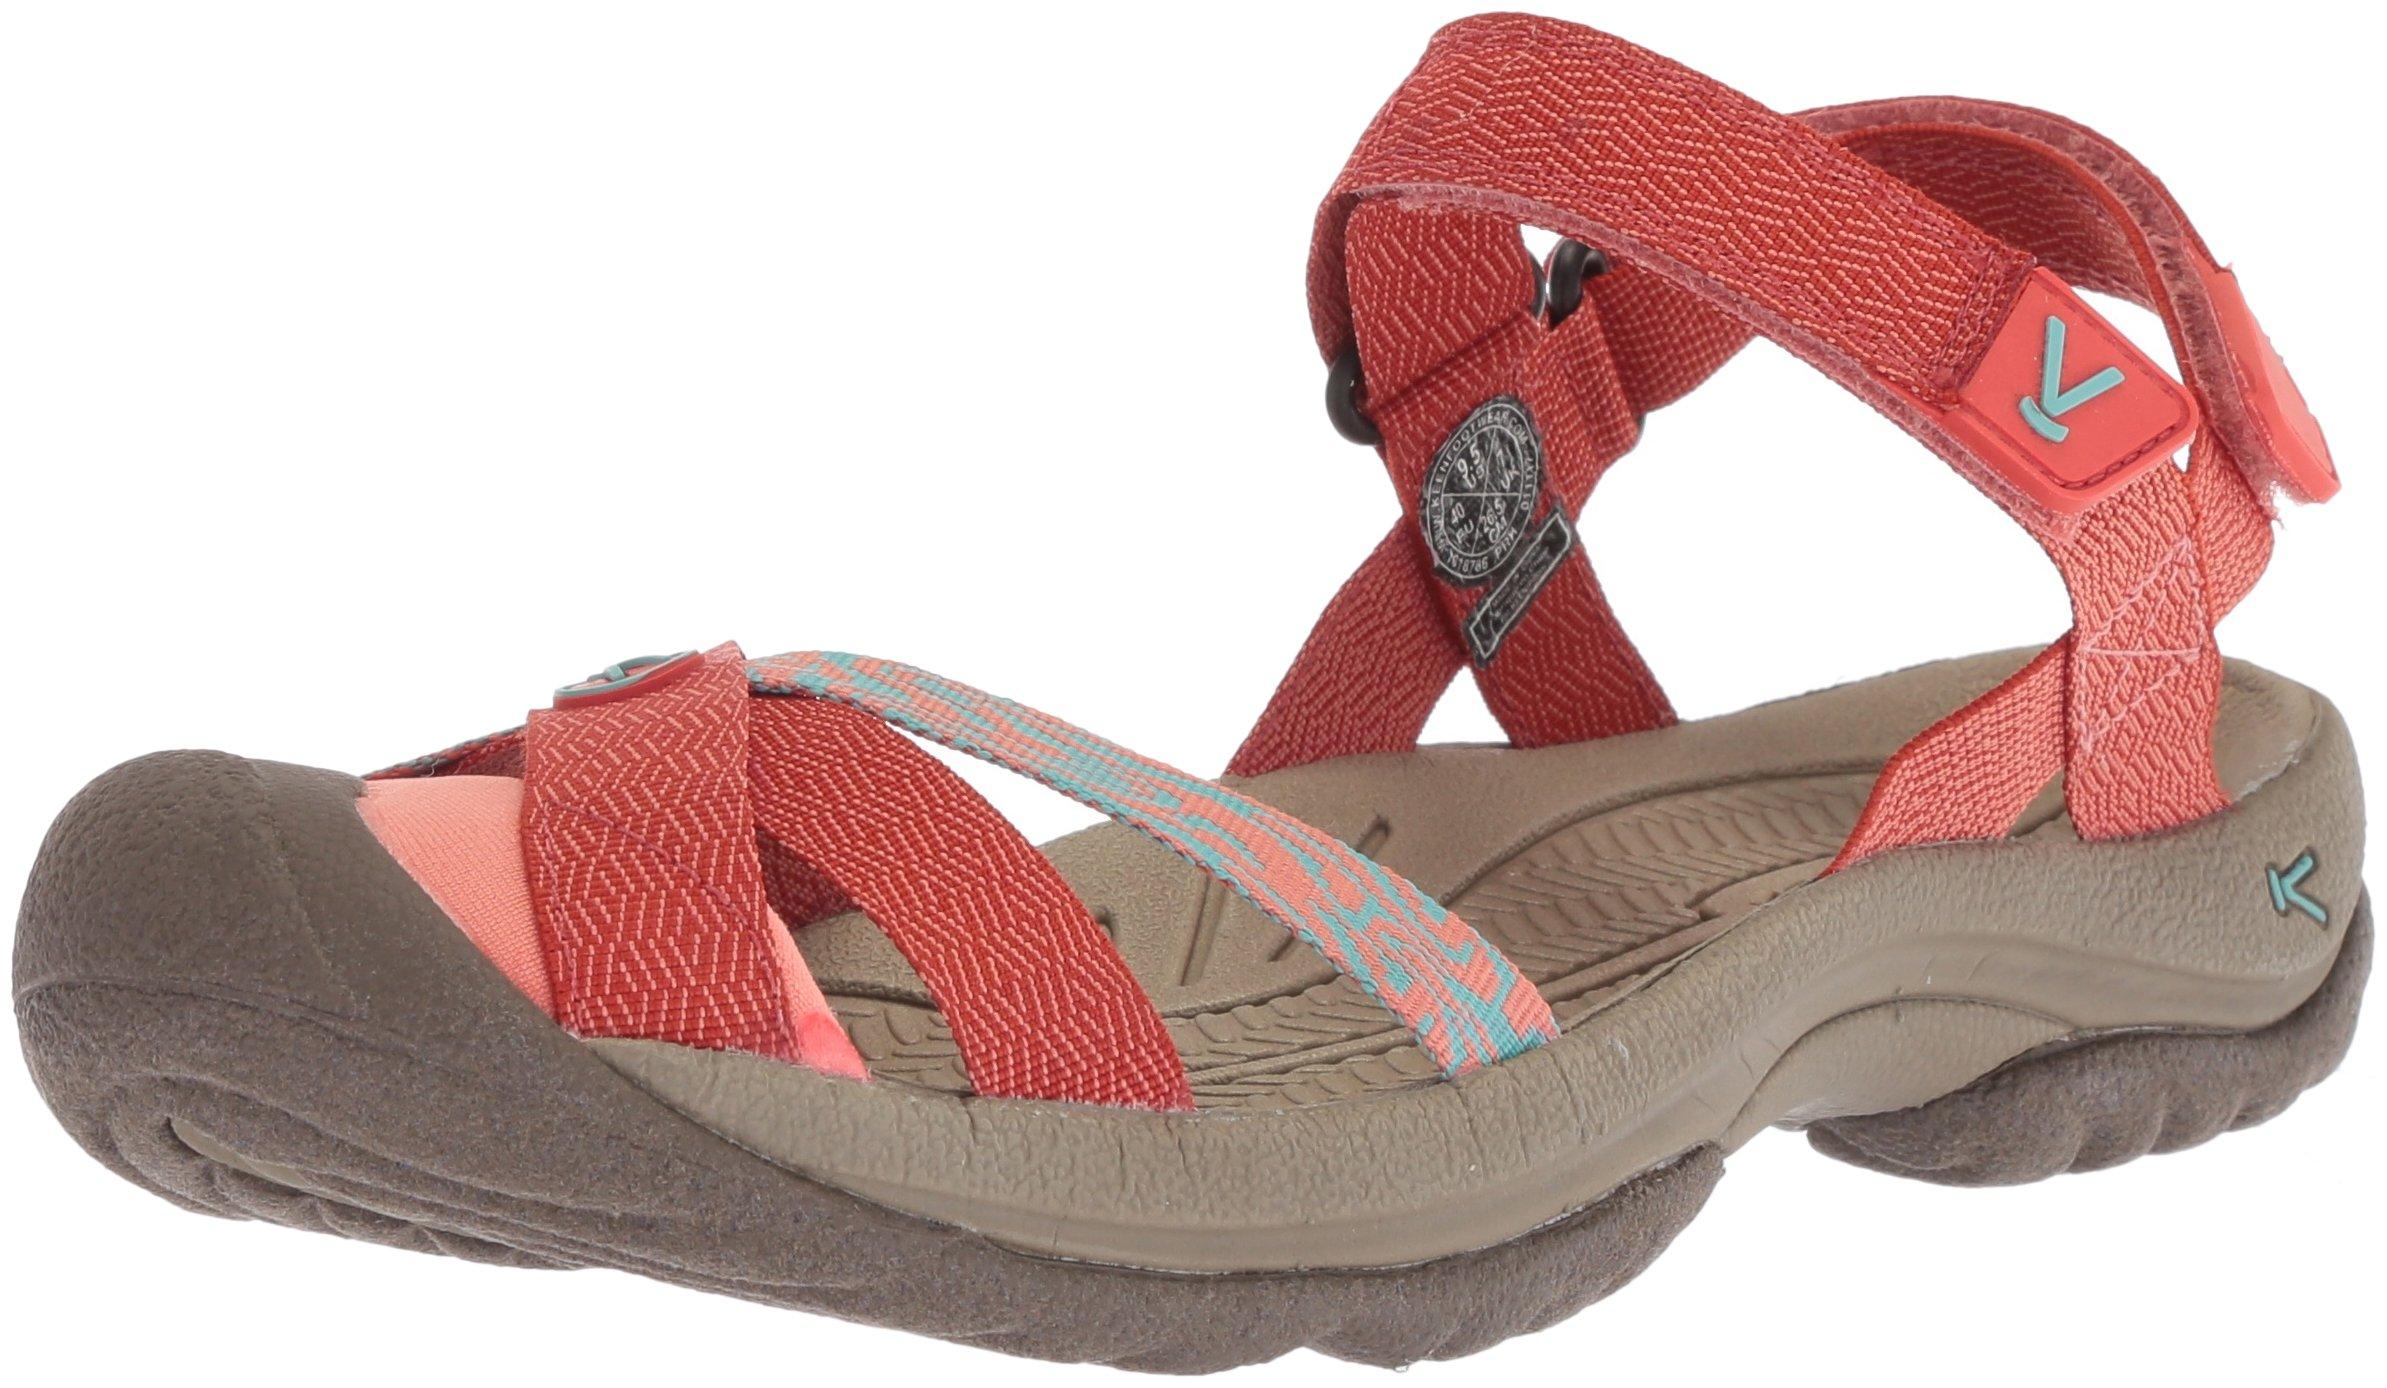 KEEN Women's Bali Strap-W Sandal, Summer Fig/Crabapple, 10.5 M US